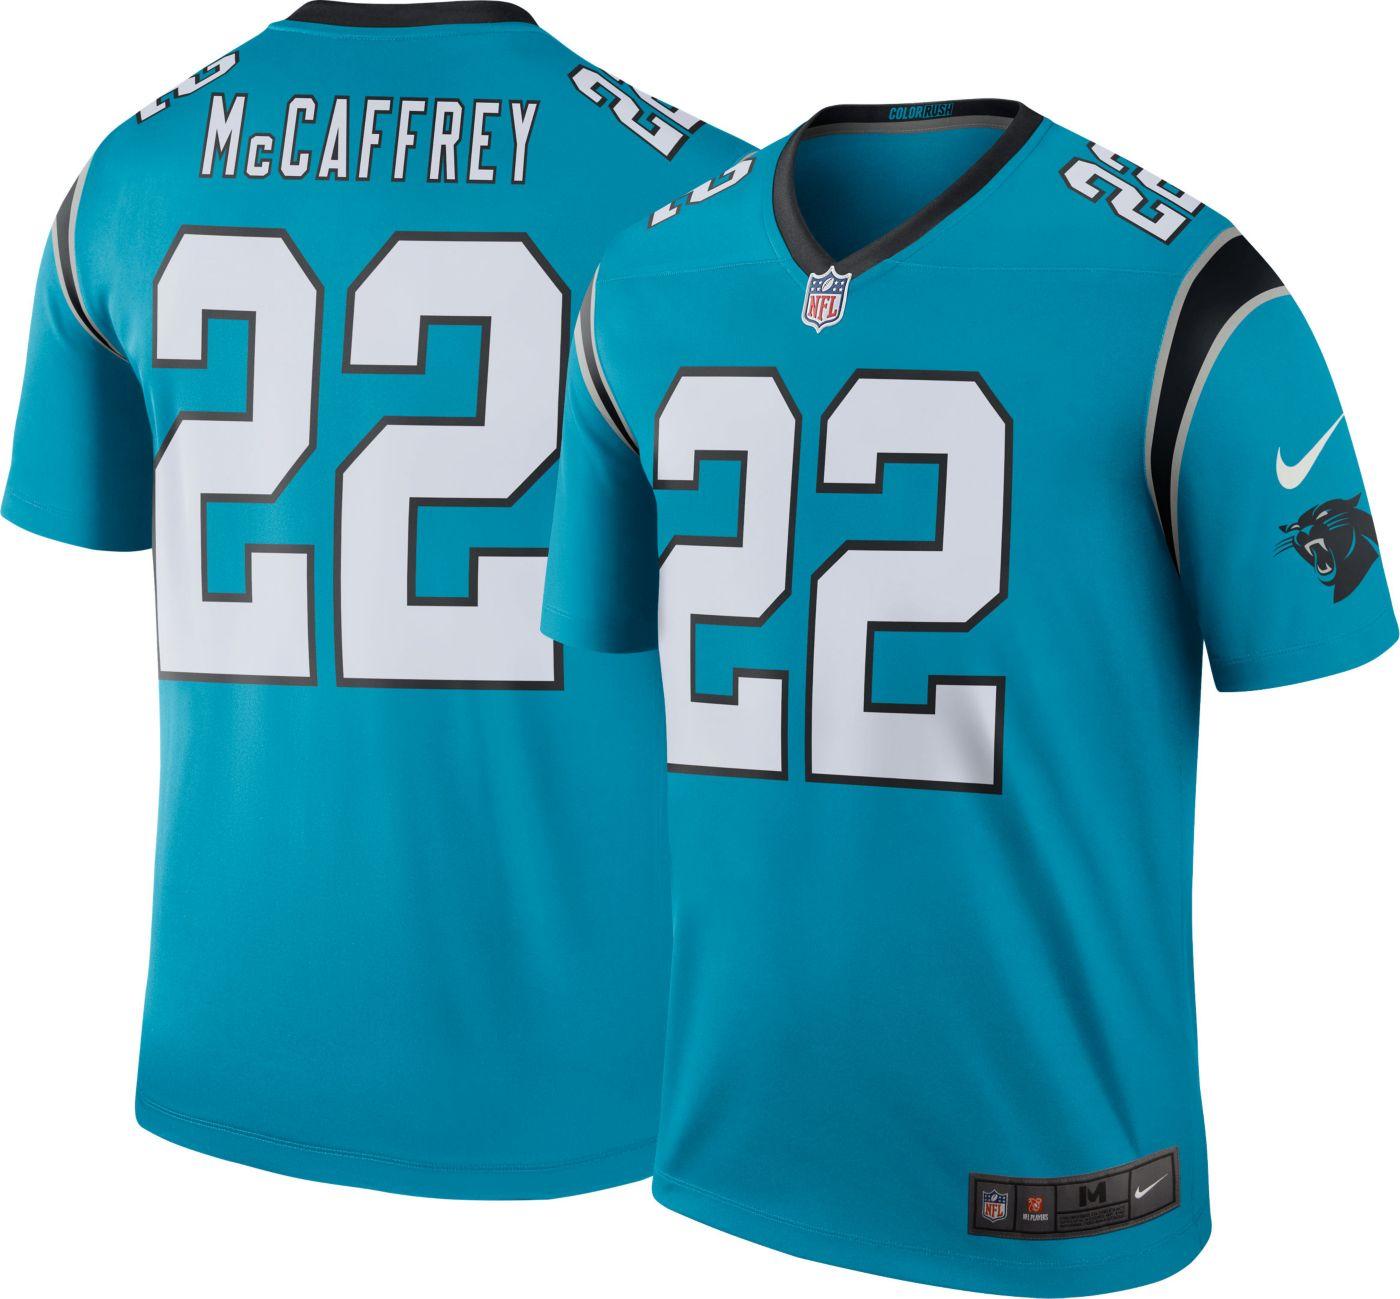 Nike Men's Color Rush Legend Jersey Carolina Panthers Christian McCaffrey #22